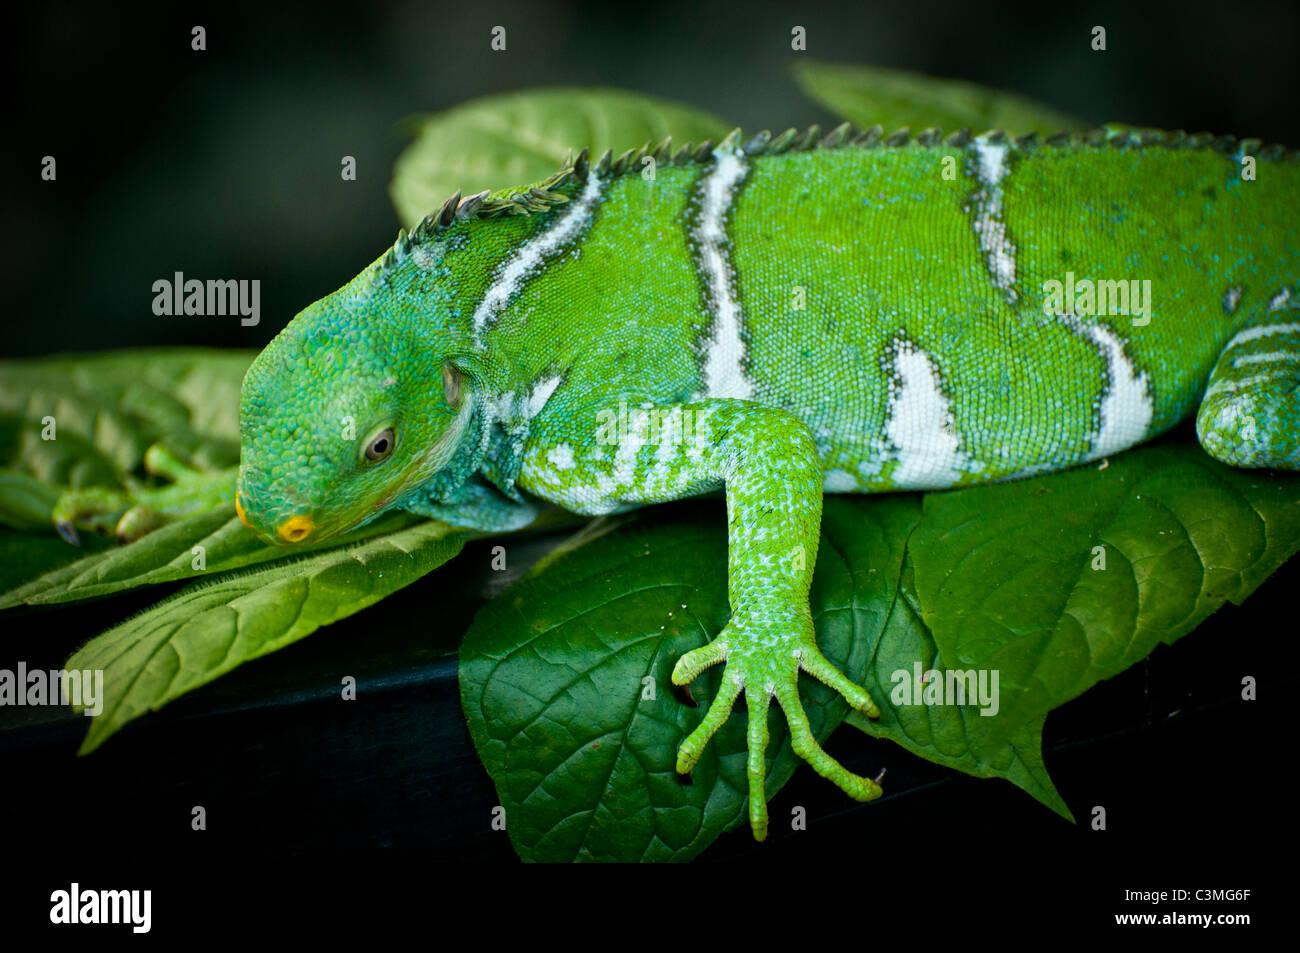 Crested Iguana, Kula Eco Park, Sigatoka ,Coral Coast, VITI LEVU ISLAND, Fiji Imagen De Stock